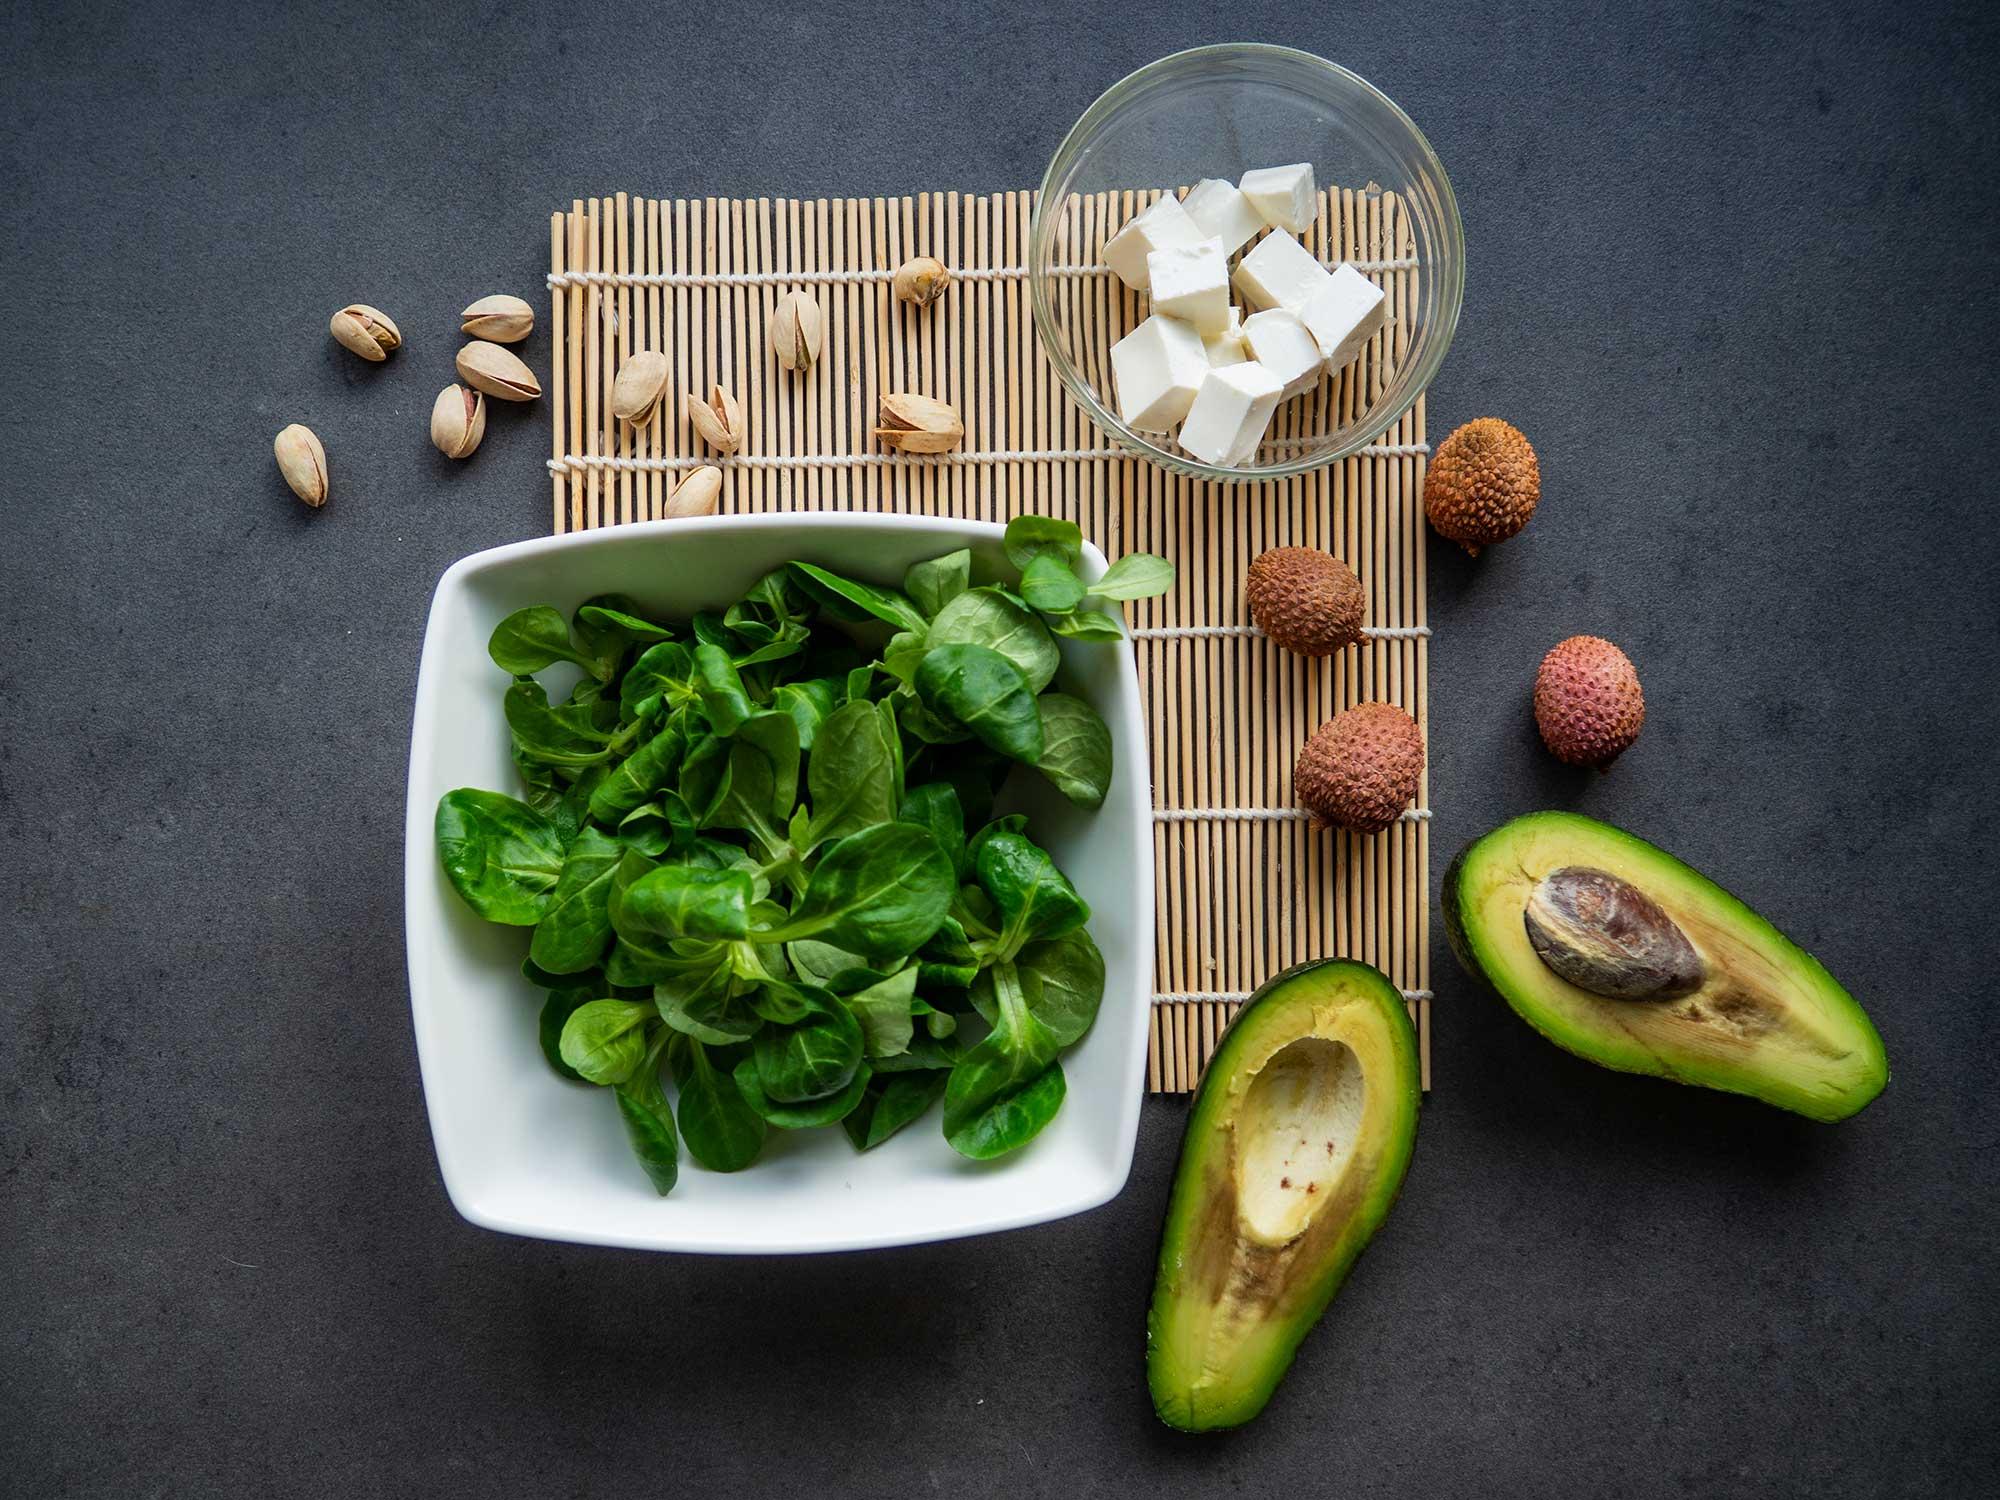 avocado, lamb's lettuce, feta cheese